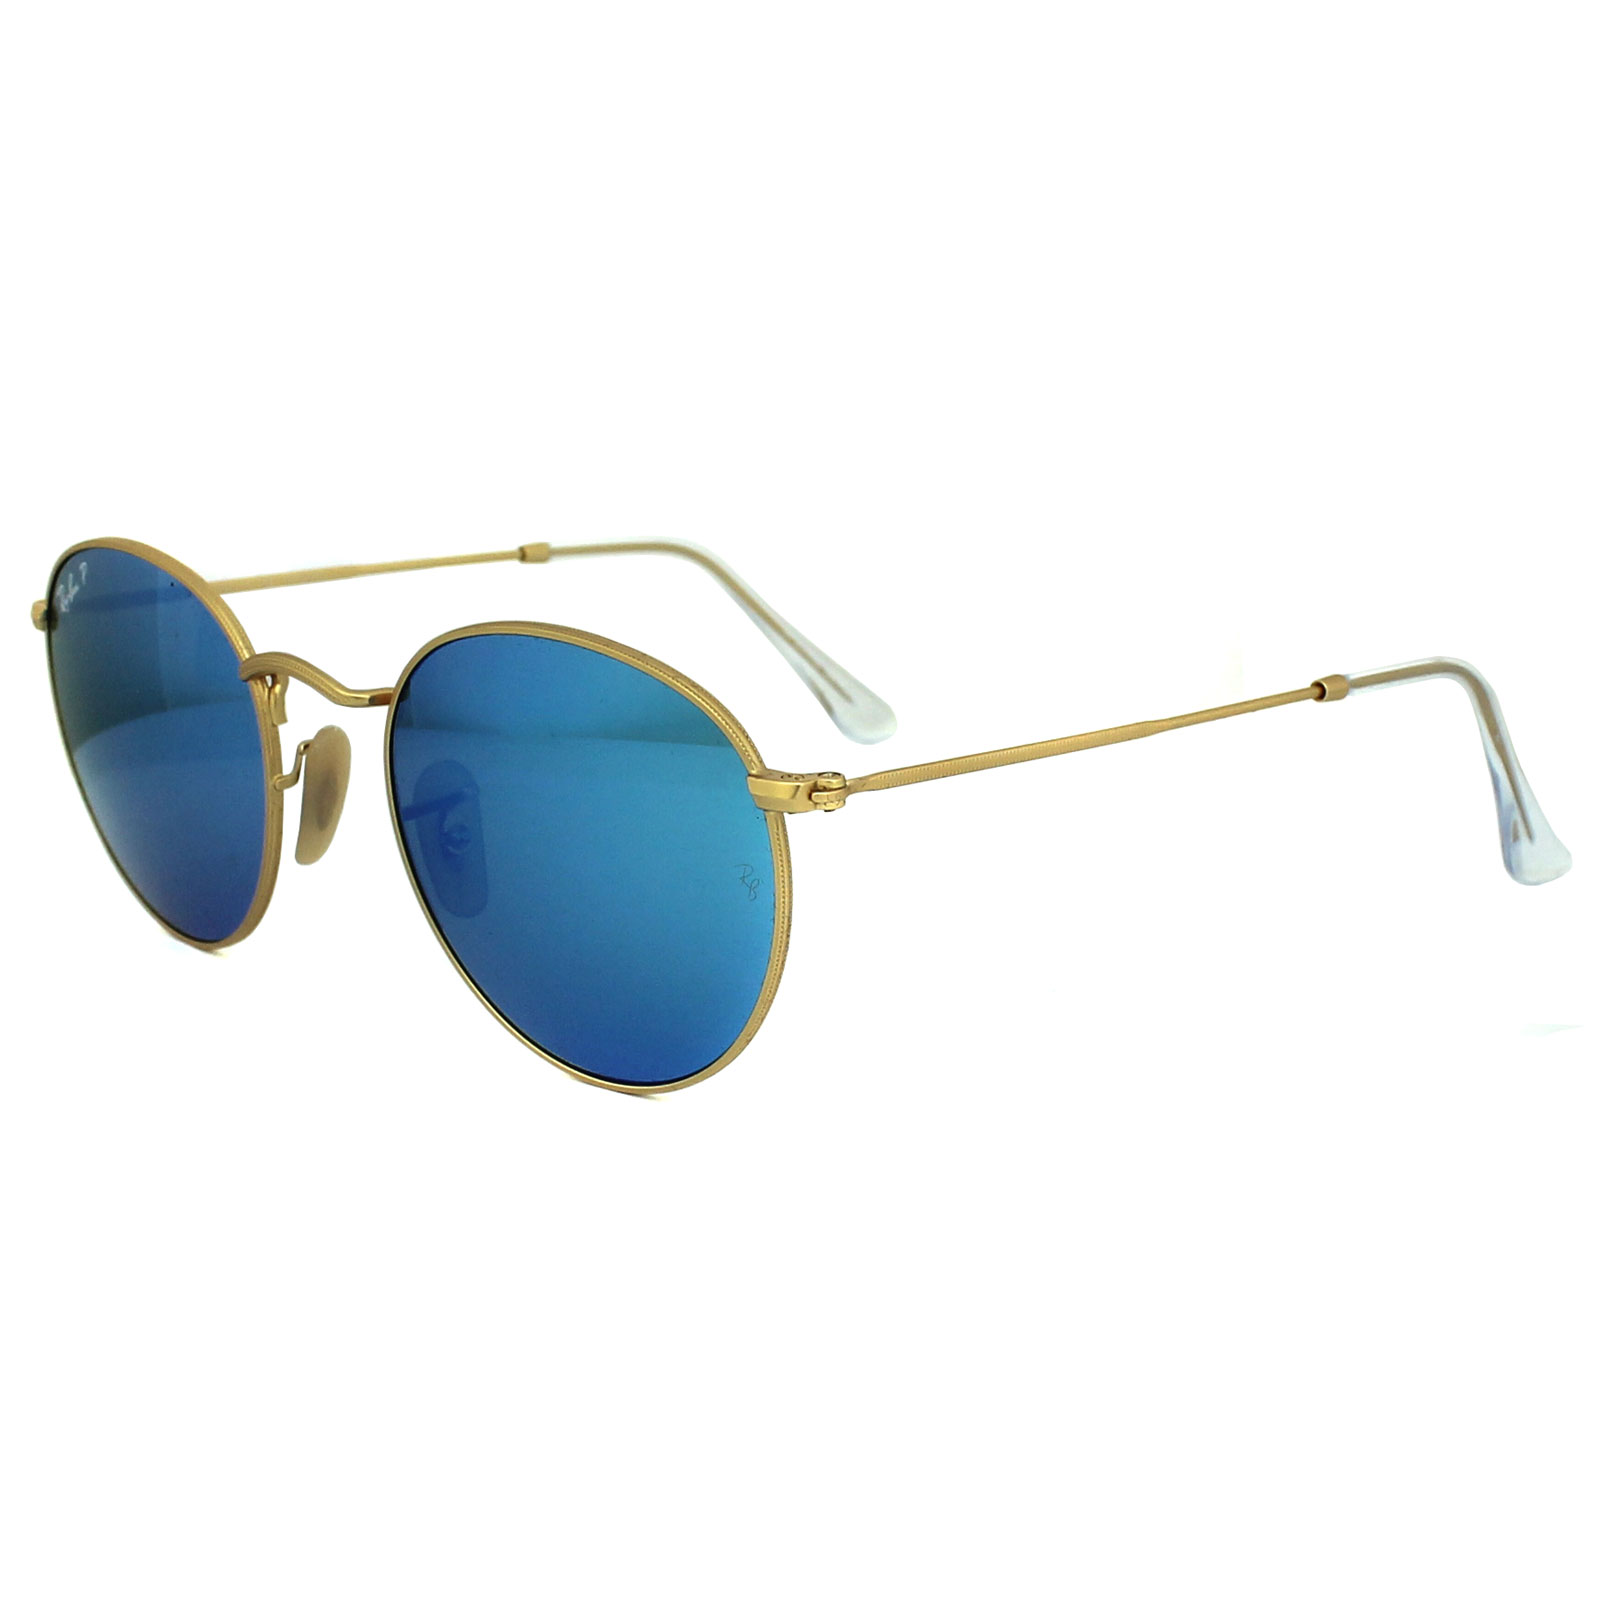 Sentinel Ray-Ban Sunglasses Round Metal 3447 112 4L Gold Blue Polarized  Flash Mirror 1f5c47f828